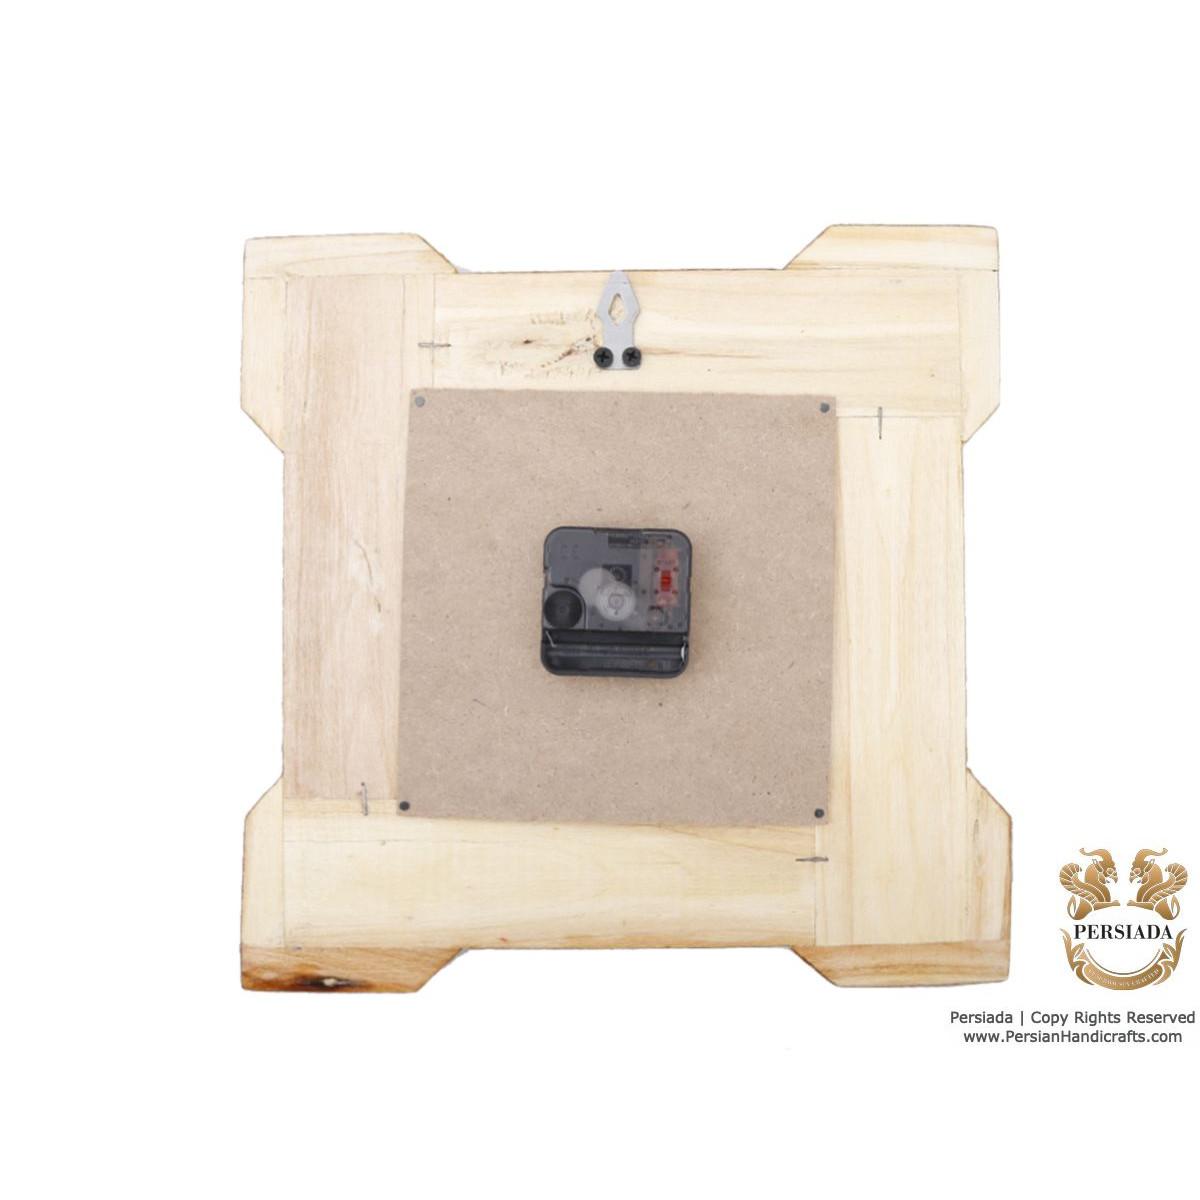 Square Wall Clock - Miniature on Khatam | HM4101 Persiada-Persian Handicrafts